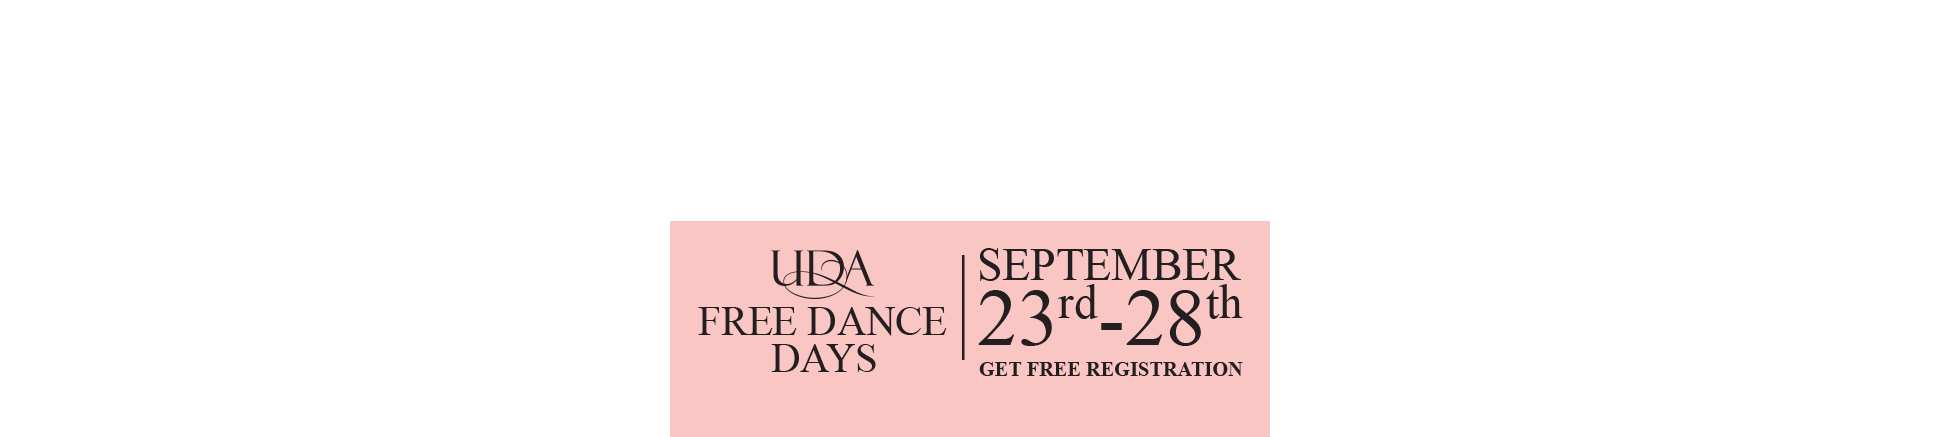 Utah Dance Artists | Ballet, Tap, Jazz, Ballroom, Modern